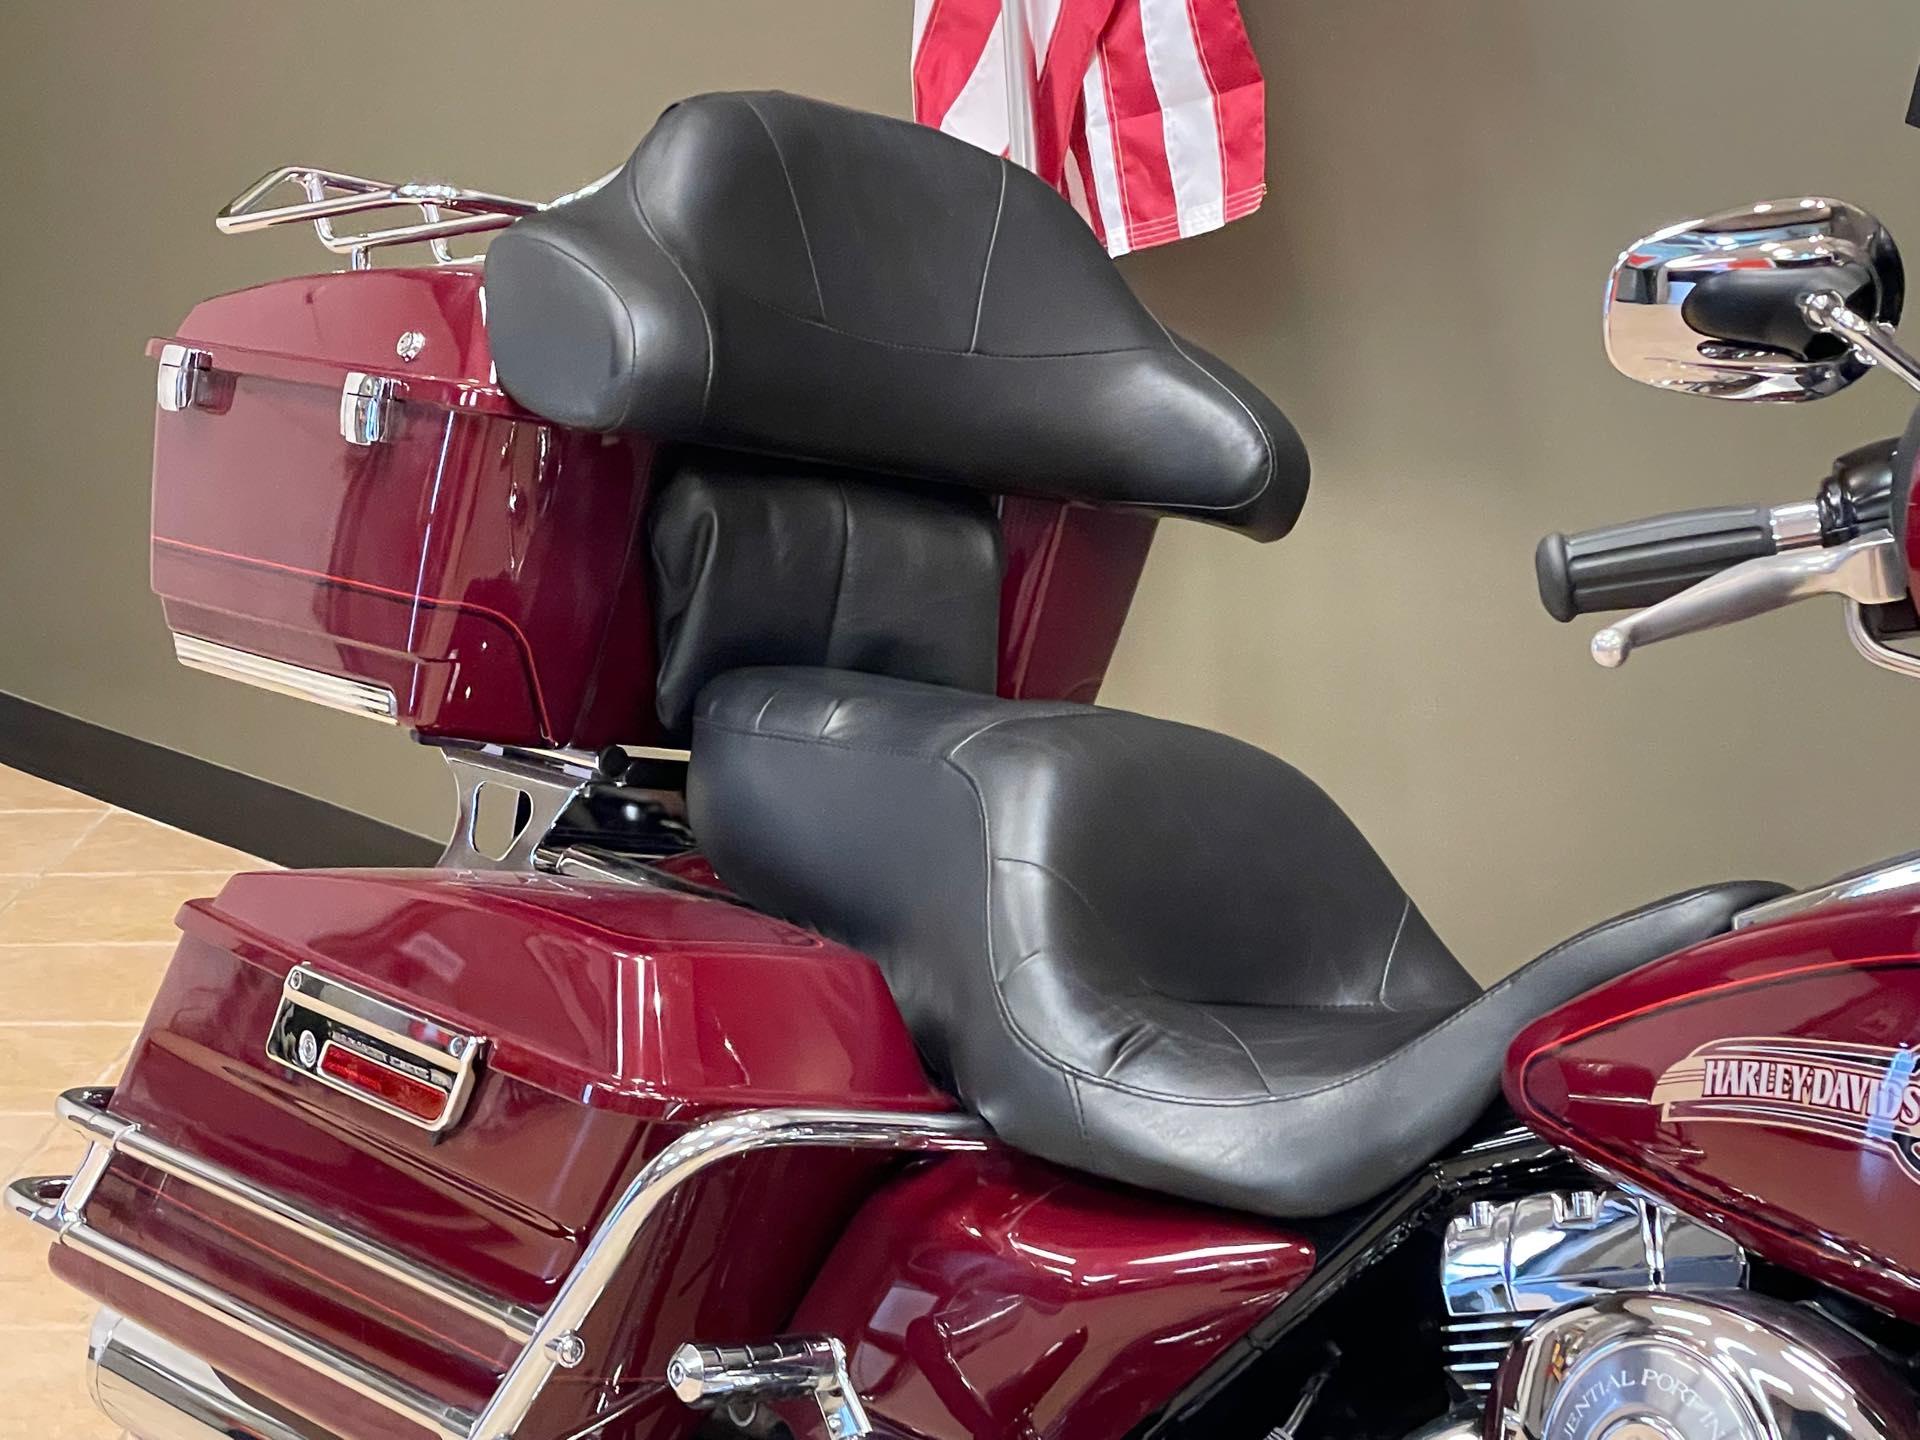 2006 Harley-Davidson Electra Glide Classic at Loess Hills Harley-Davidson